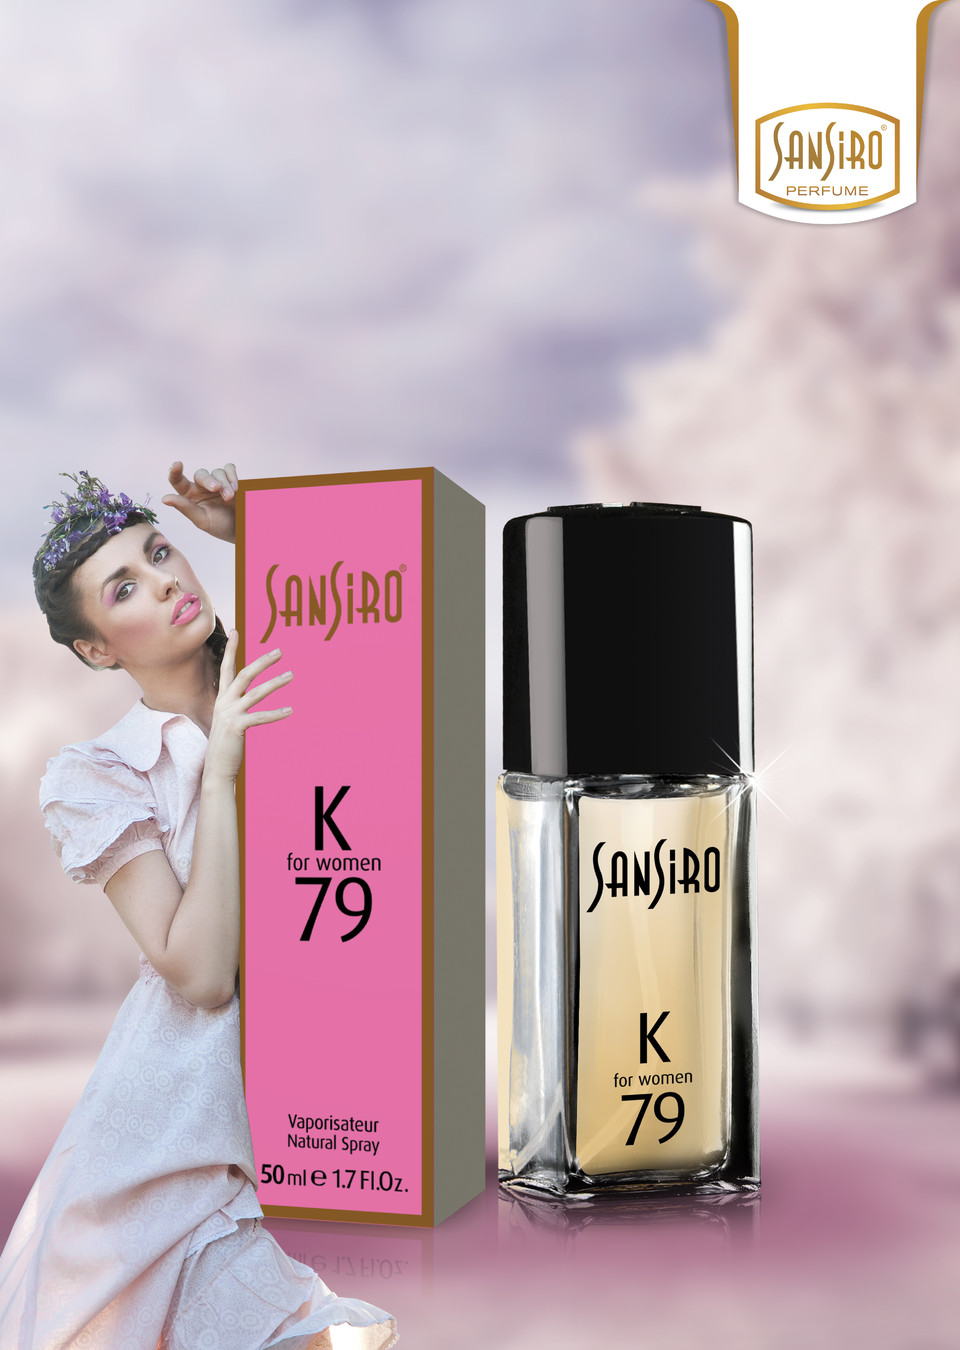 Sansiro Perfume - For Women - Pares (K79)